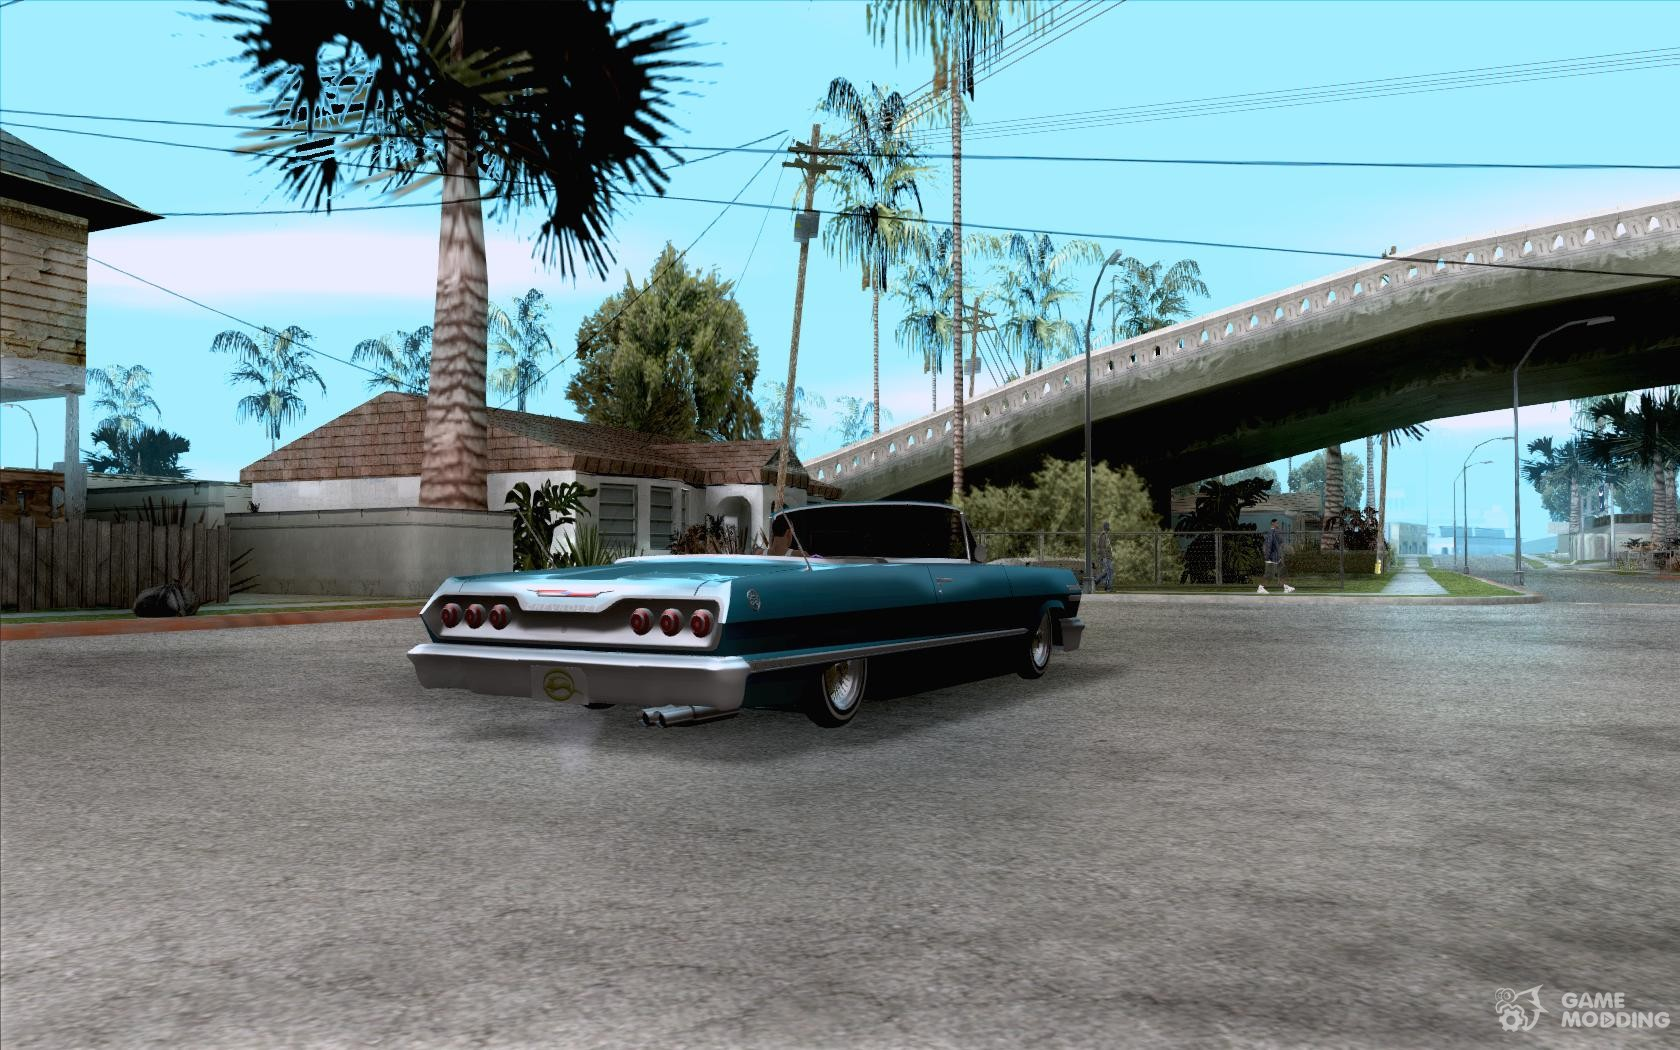 Chevrolet impala 4 door hardtop 1963 for gta san andreas - Chevrolet Impala Hardtop 1963 For Gta San Andreas Top View